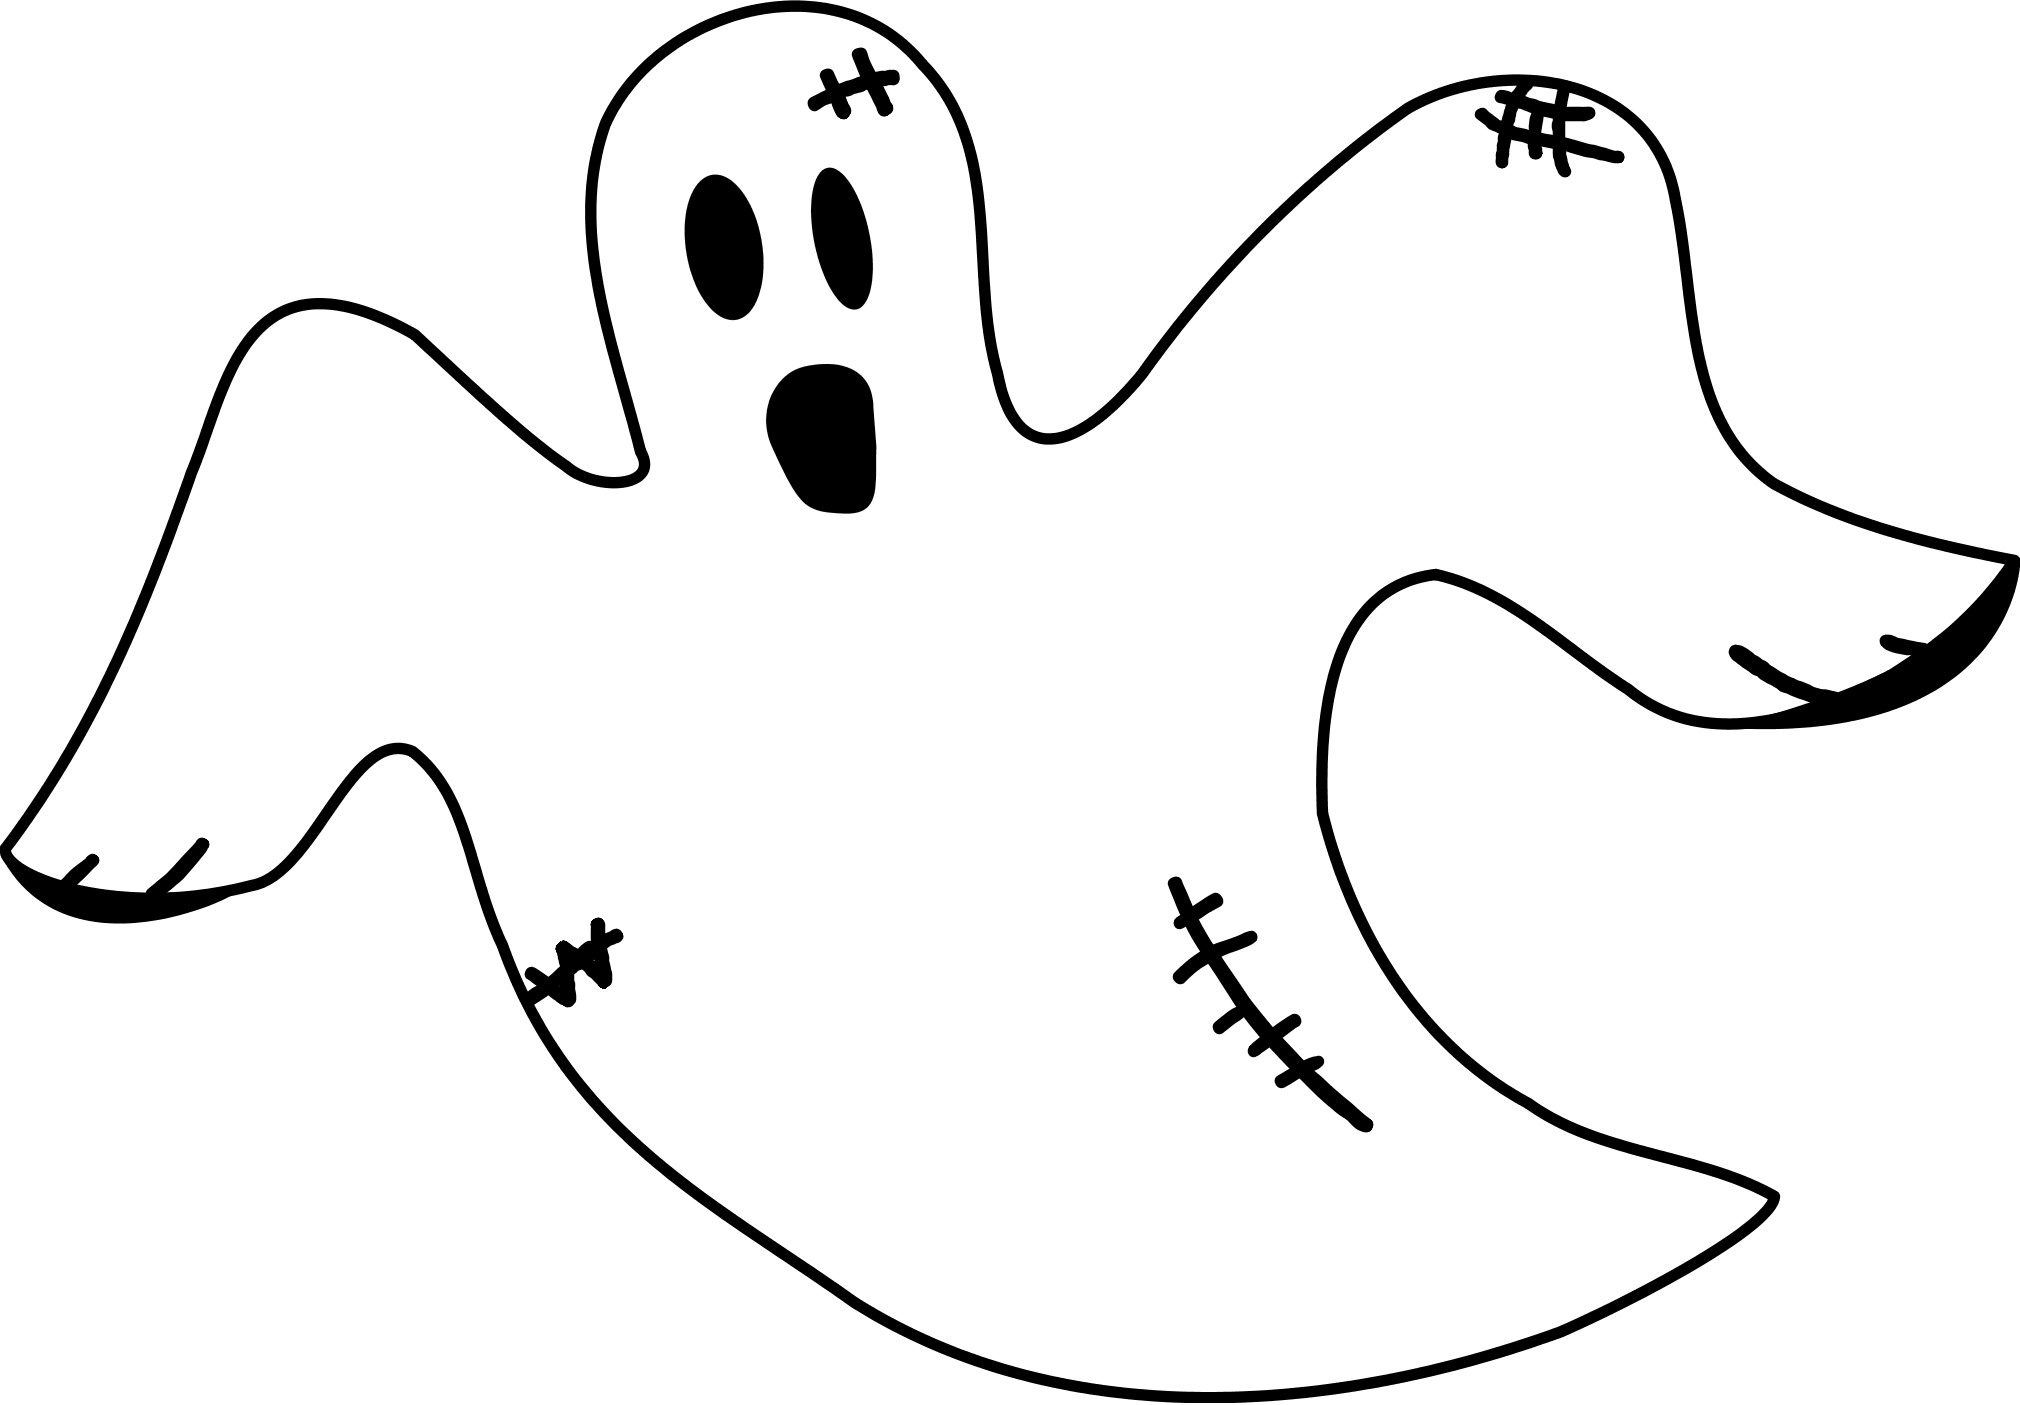 Ghost Clip Art-Ghost Clip Art-0